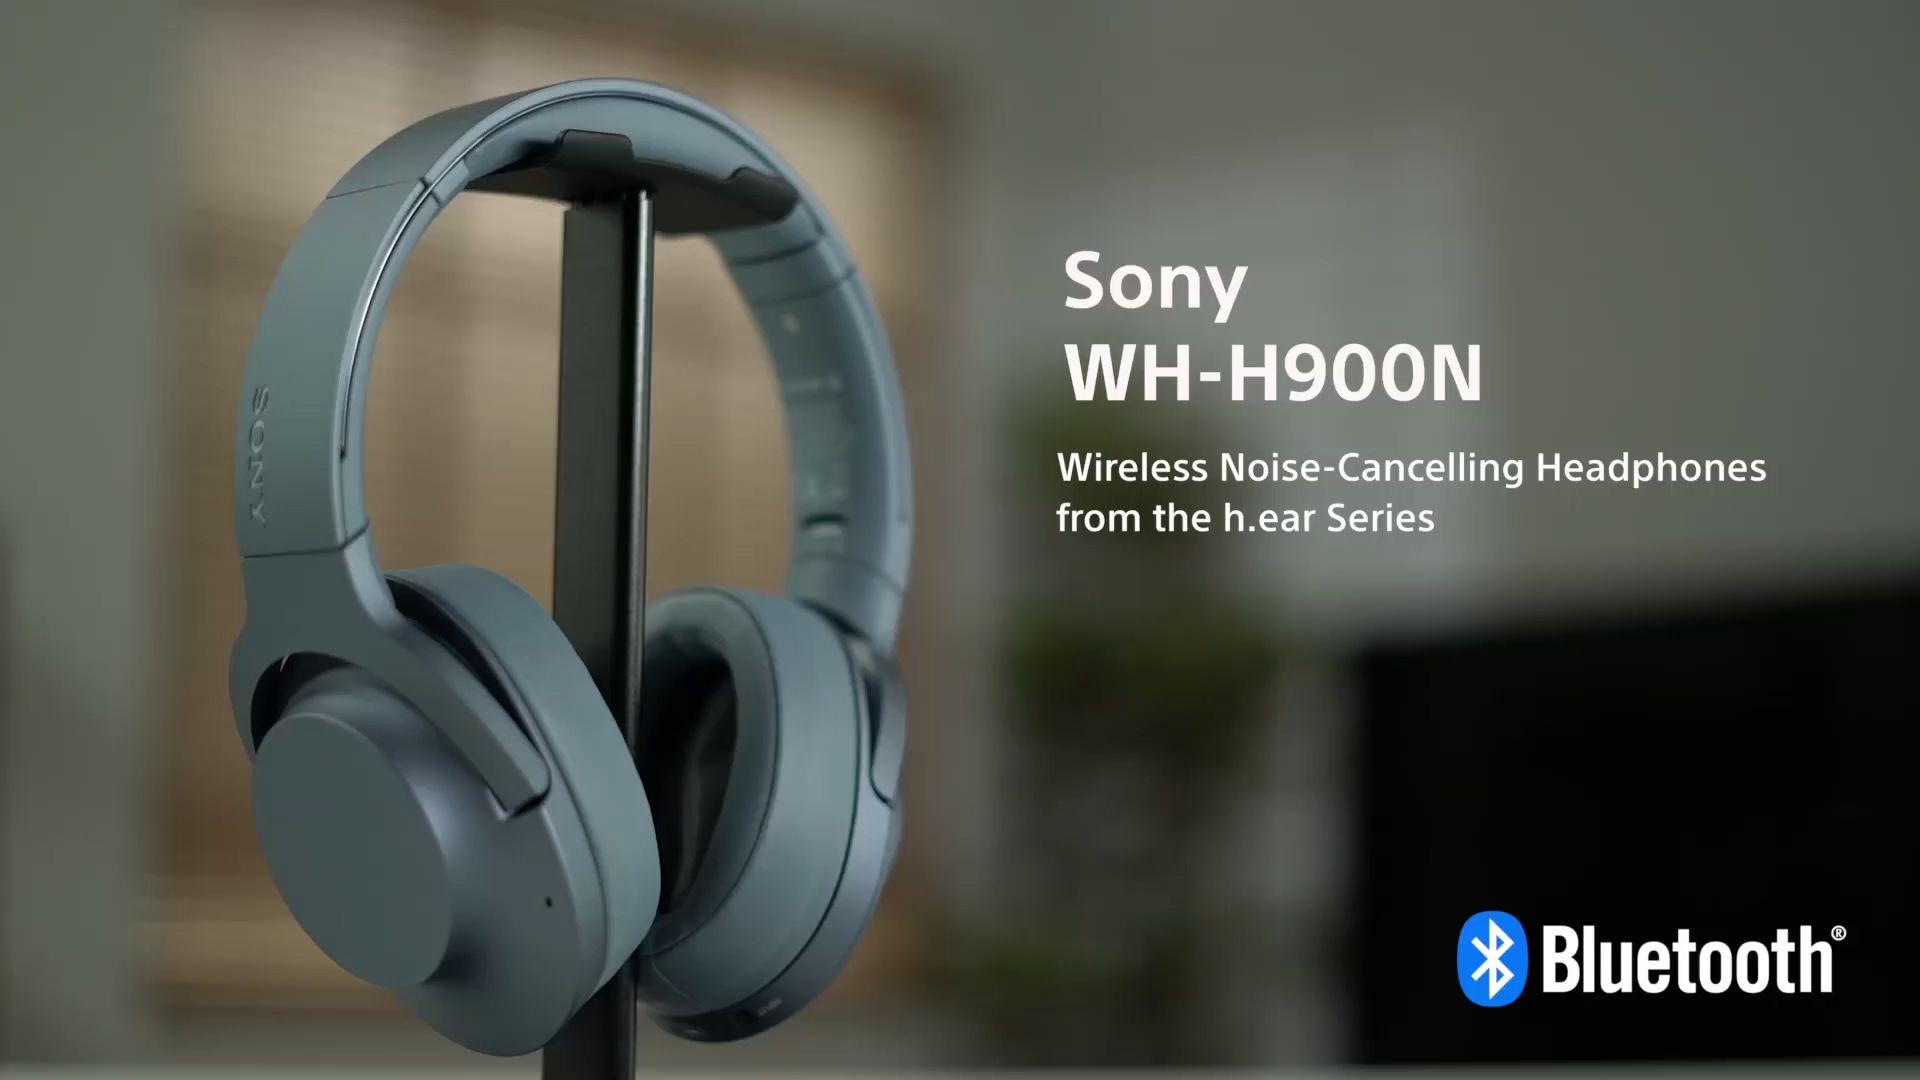 5dbc8da838a Sony WH-H900N h.ear on 2 Wireless Noise Cancelling Headphone - WESTORE